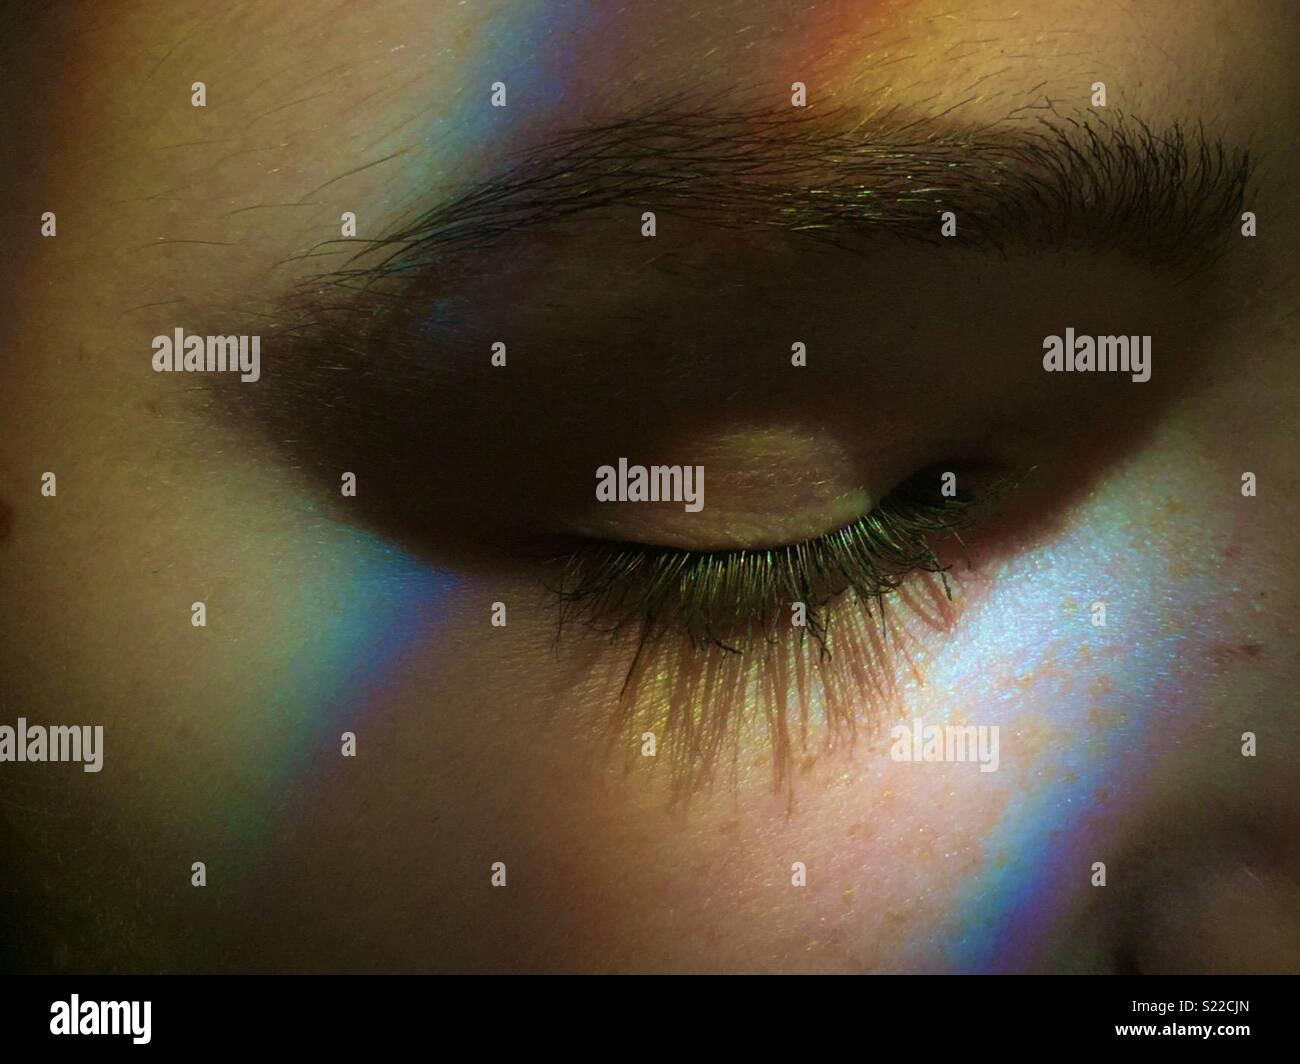 Mädchen Wimpern beleuchtet mit Rainbow Light Stockbild